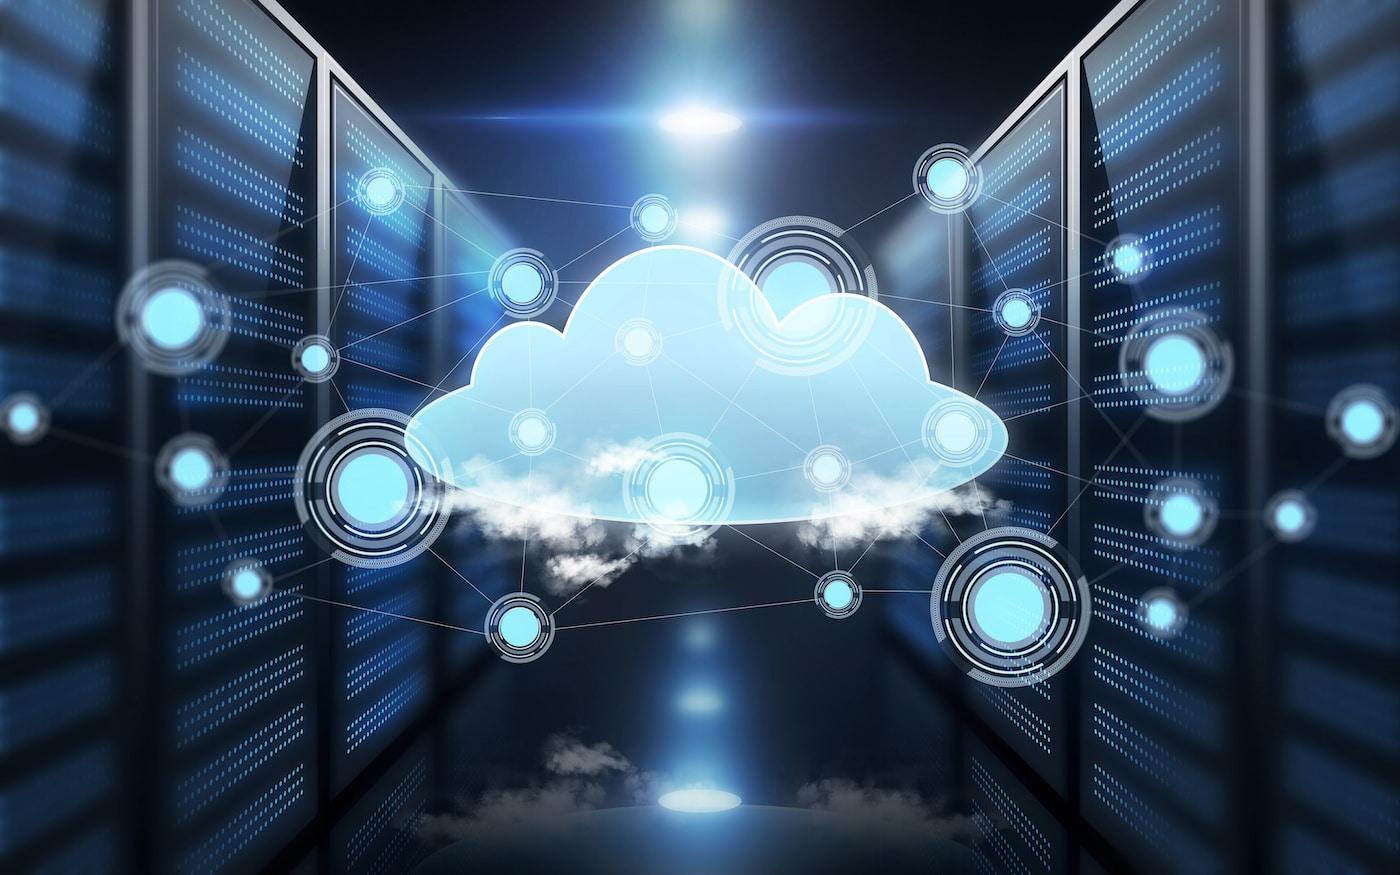 cloud hosting service | cloud hosting company | how to select a web hosting company | cloud hosting | web hosting